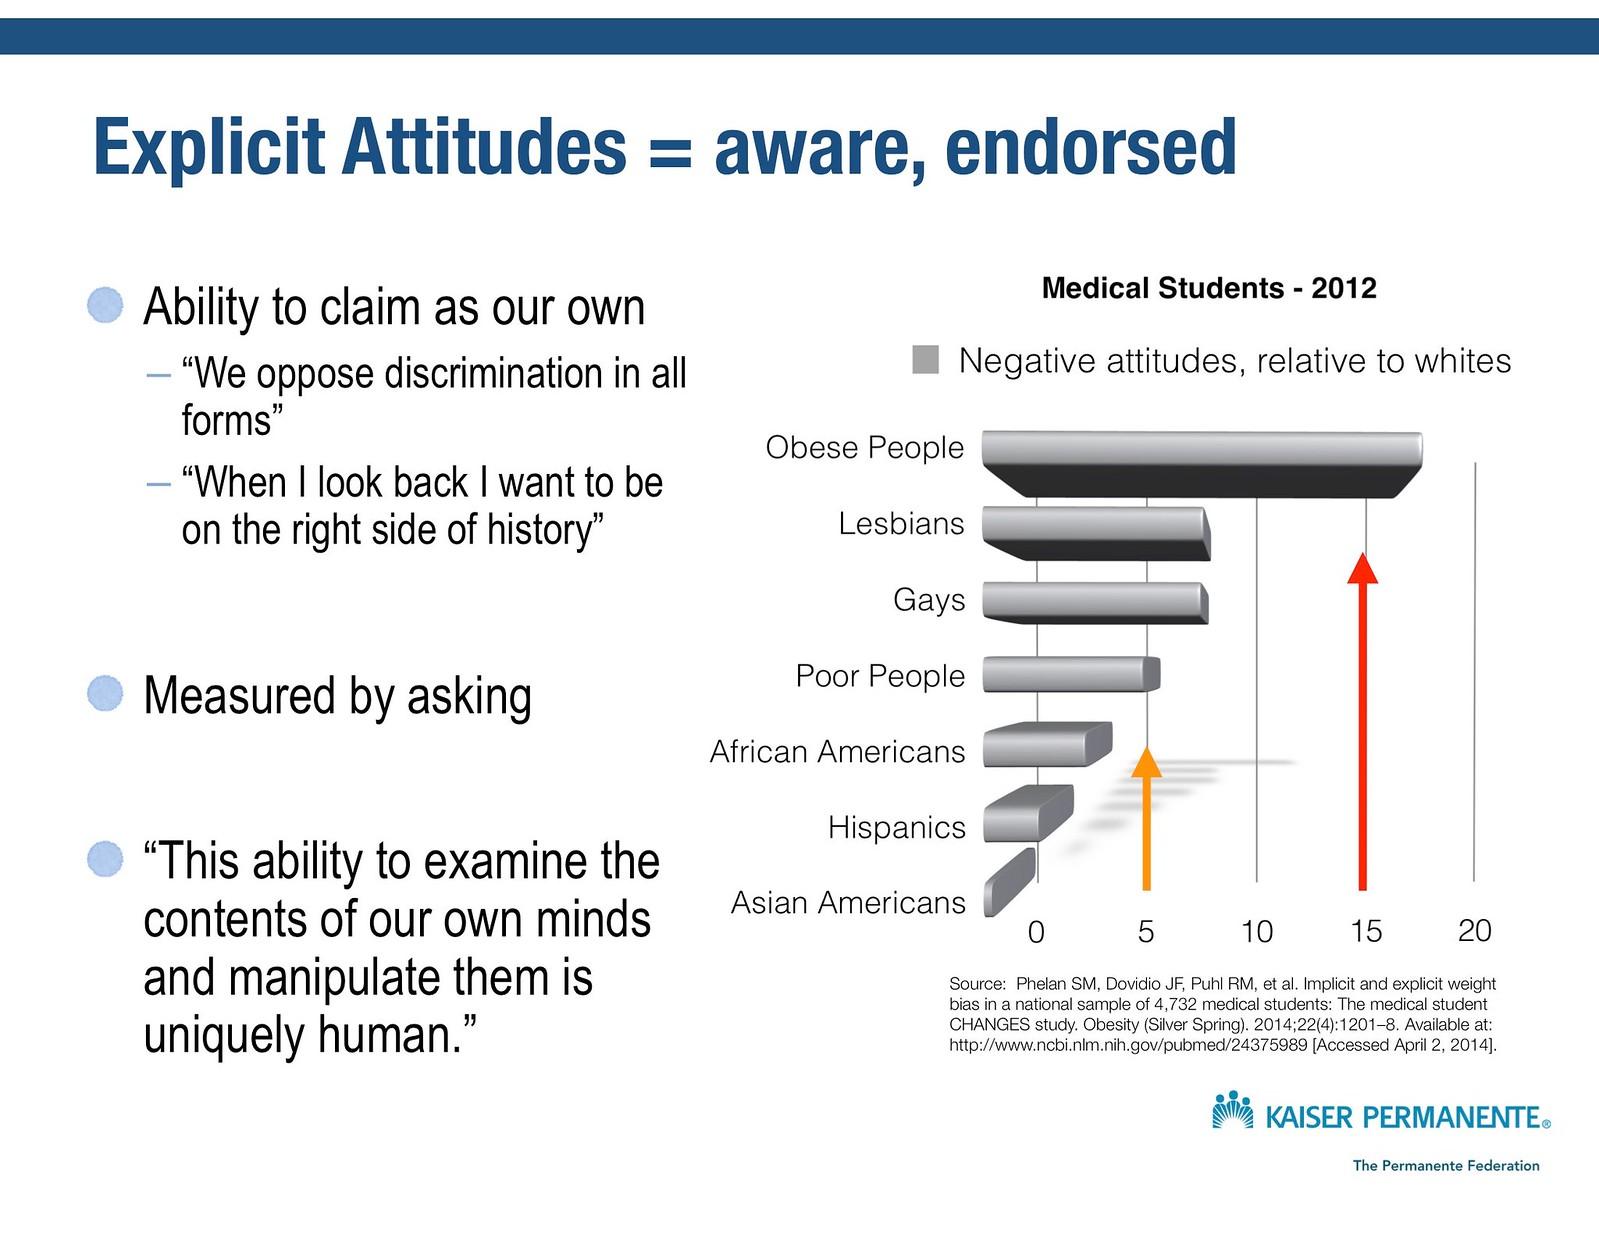 Explicit attitudes among medical students 54441